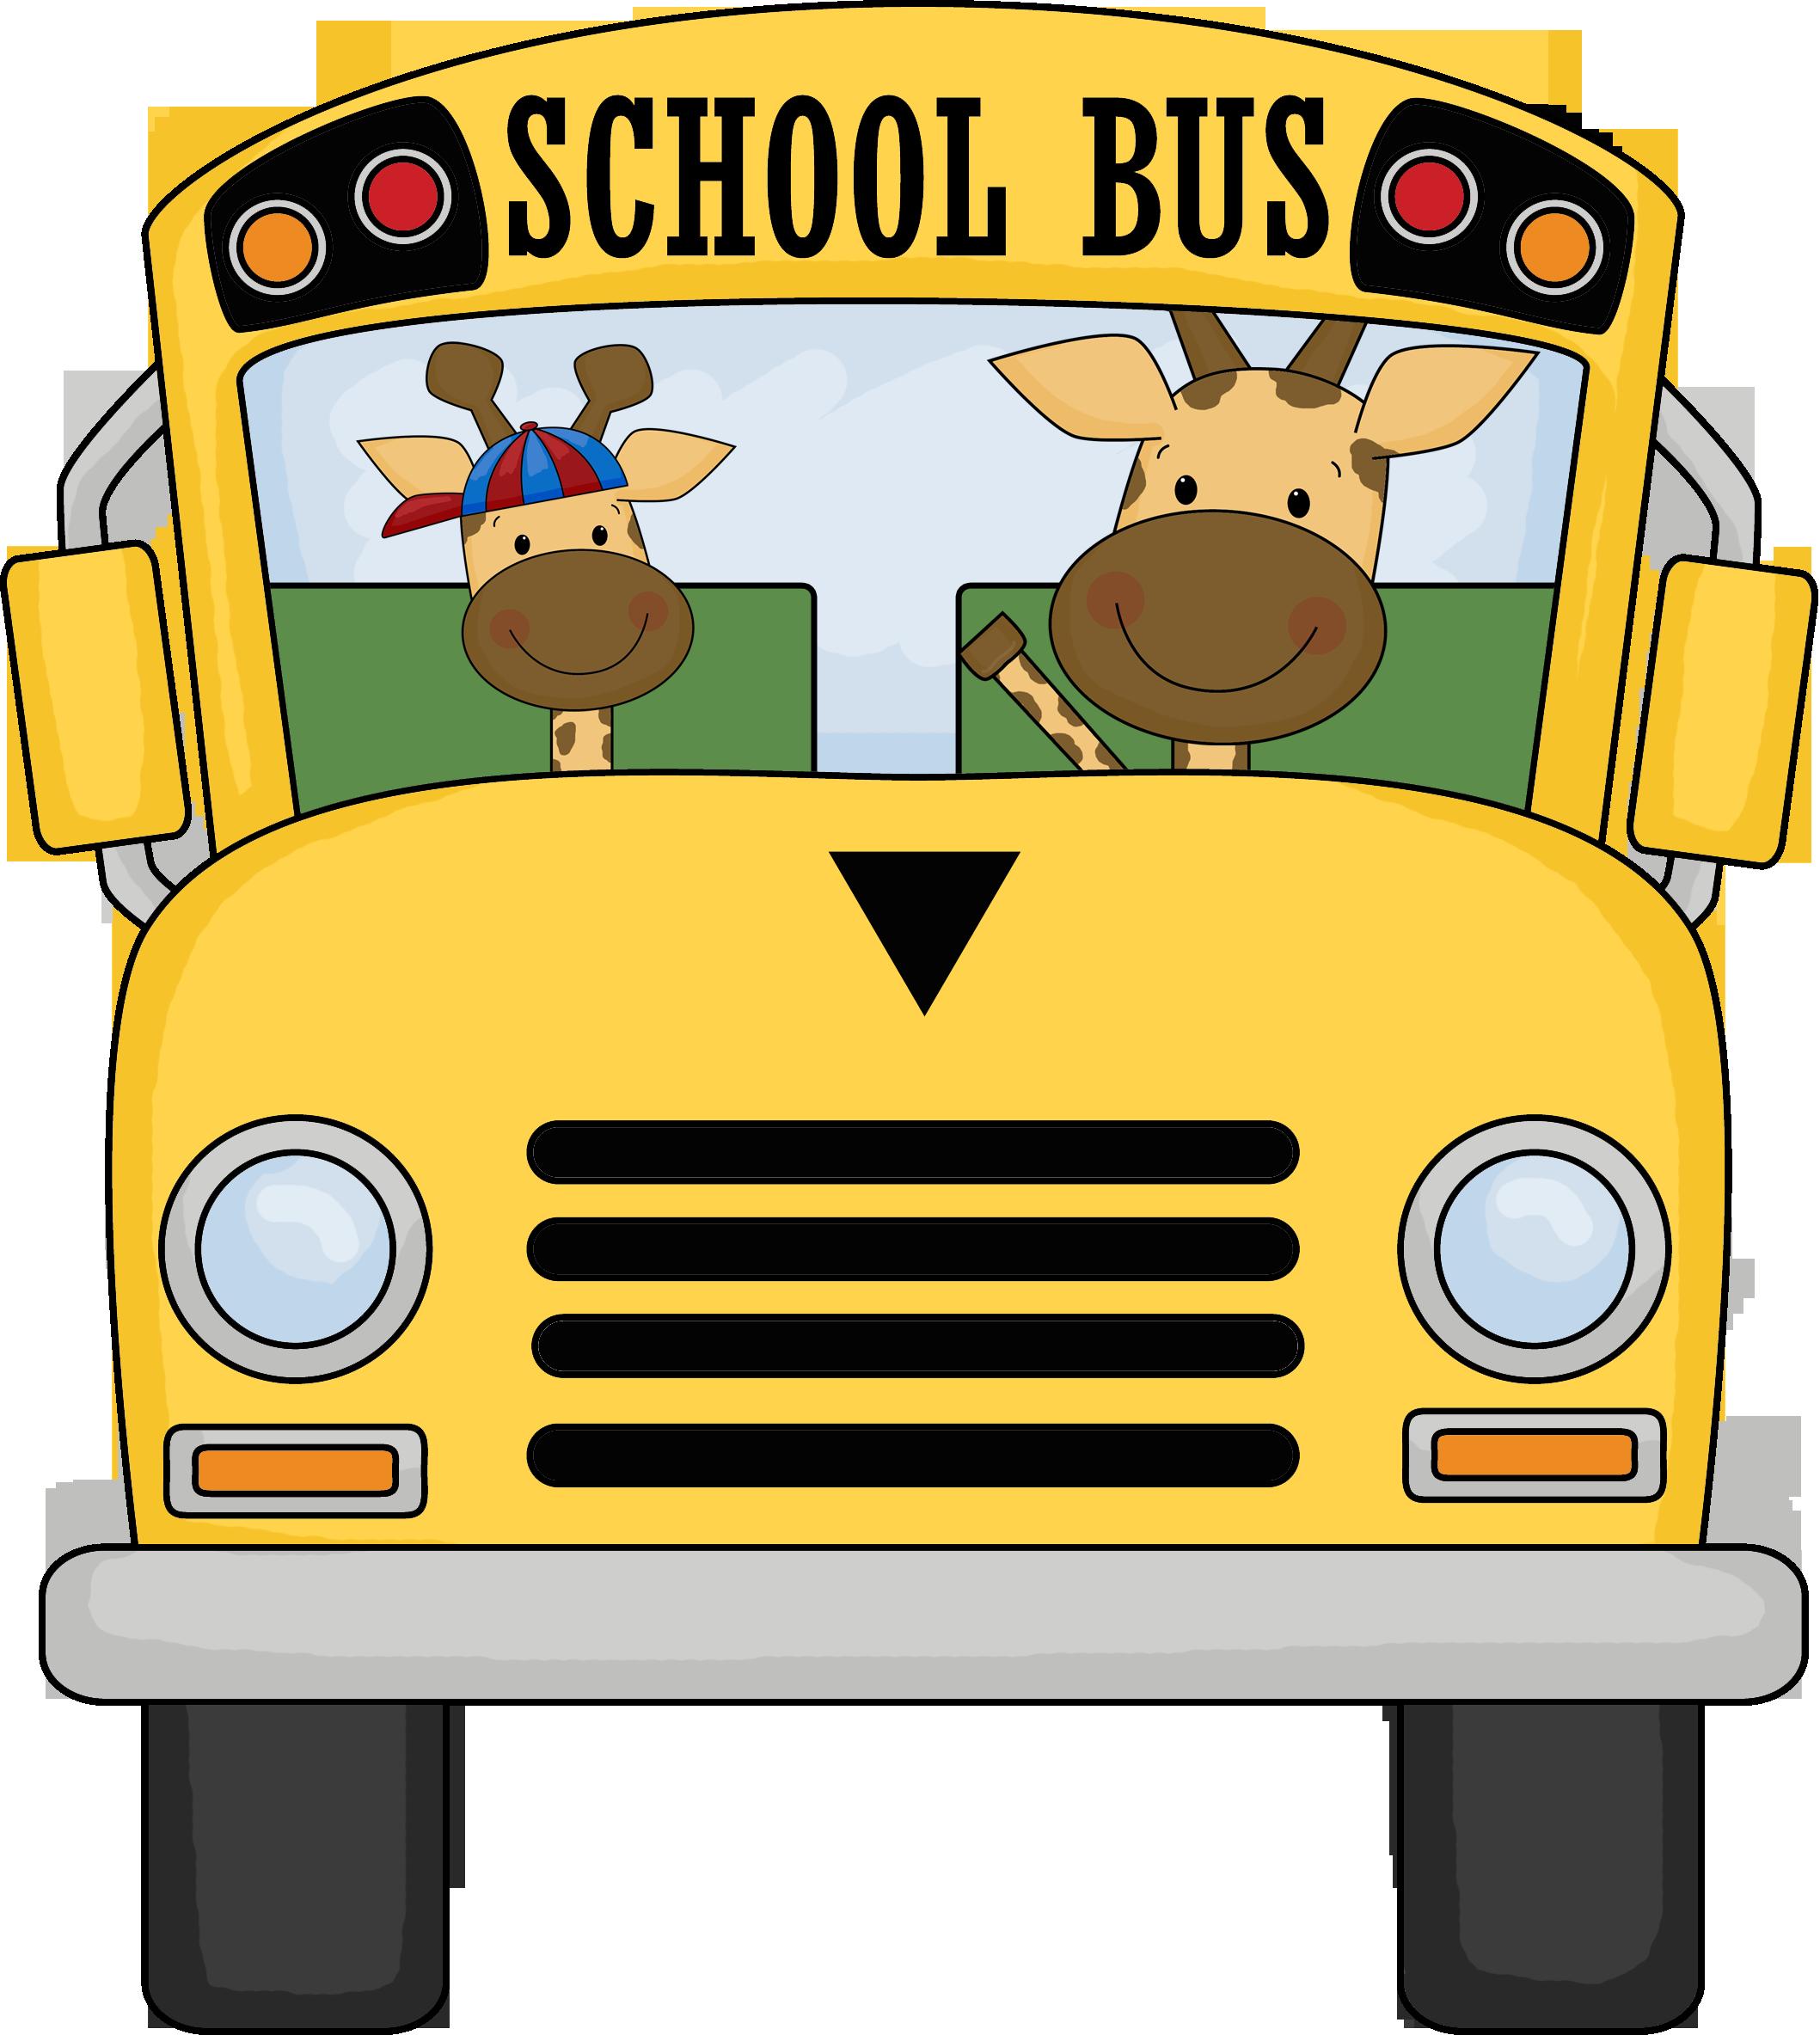 Inside school bus clipart svg transparent Bus Information - Pepperhill Elementary School svg transparent